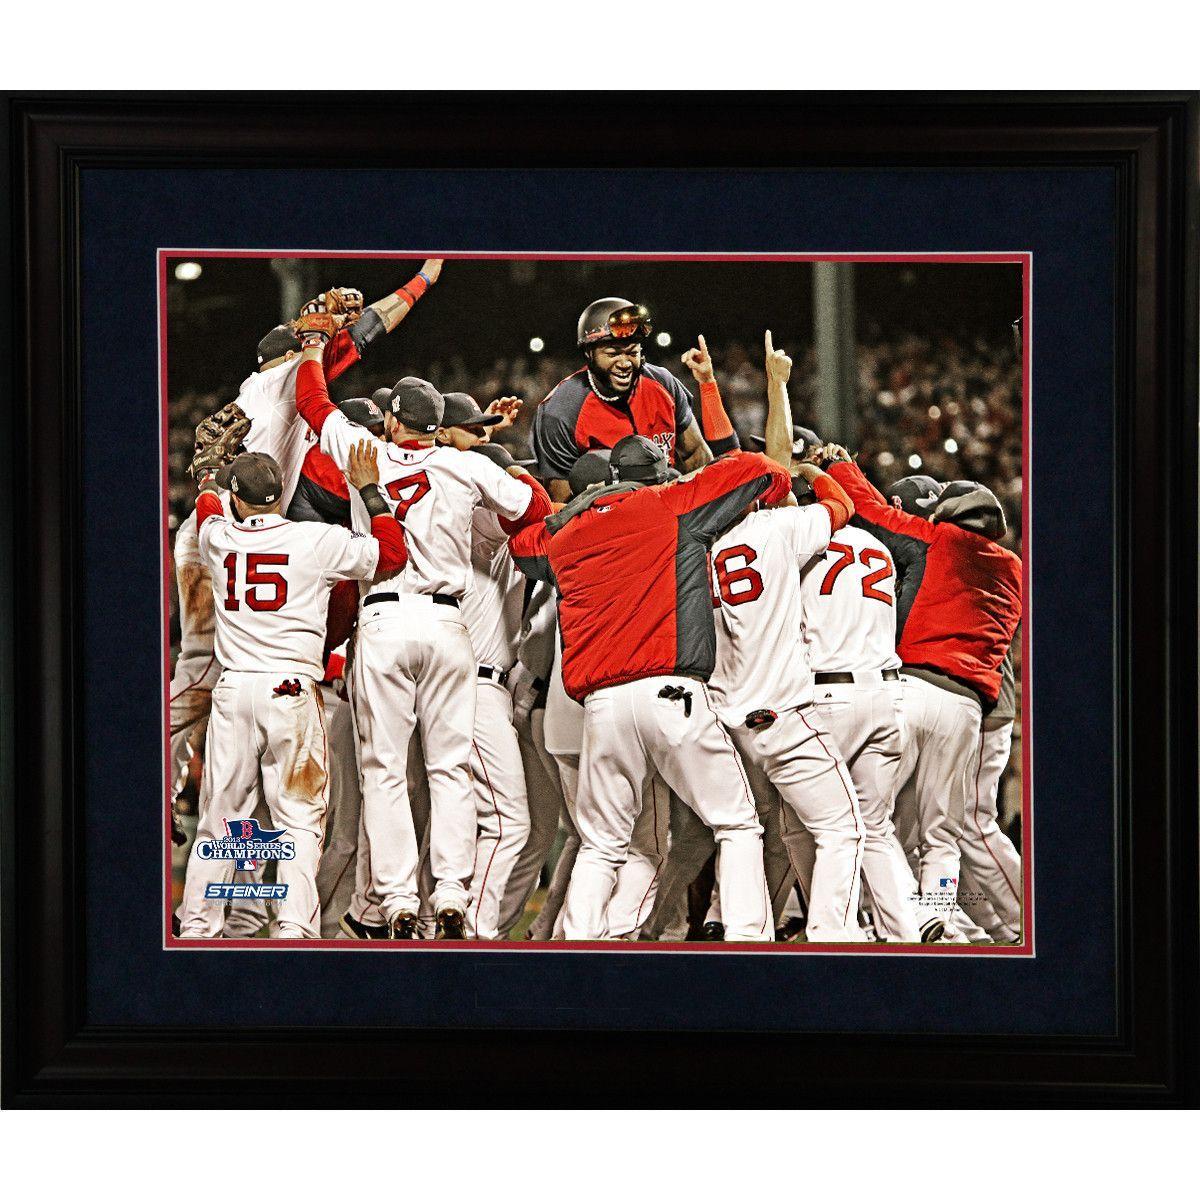 Boston Red Sox 2013 World Series Champs Celebration 8x10 Framed Photo